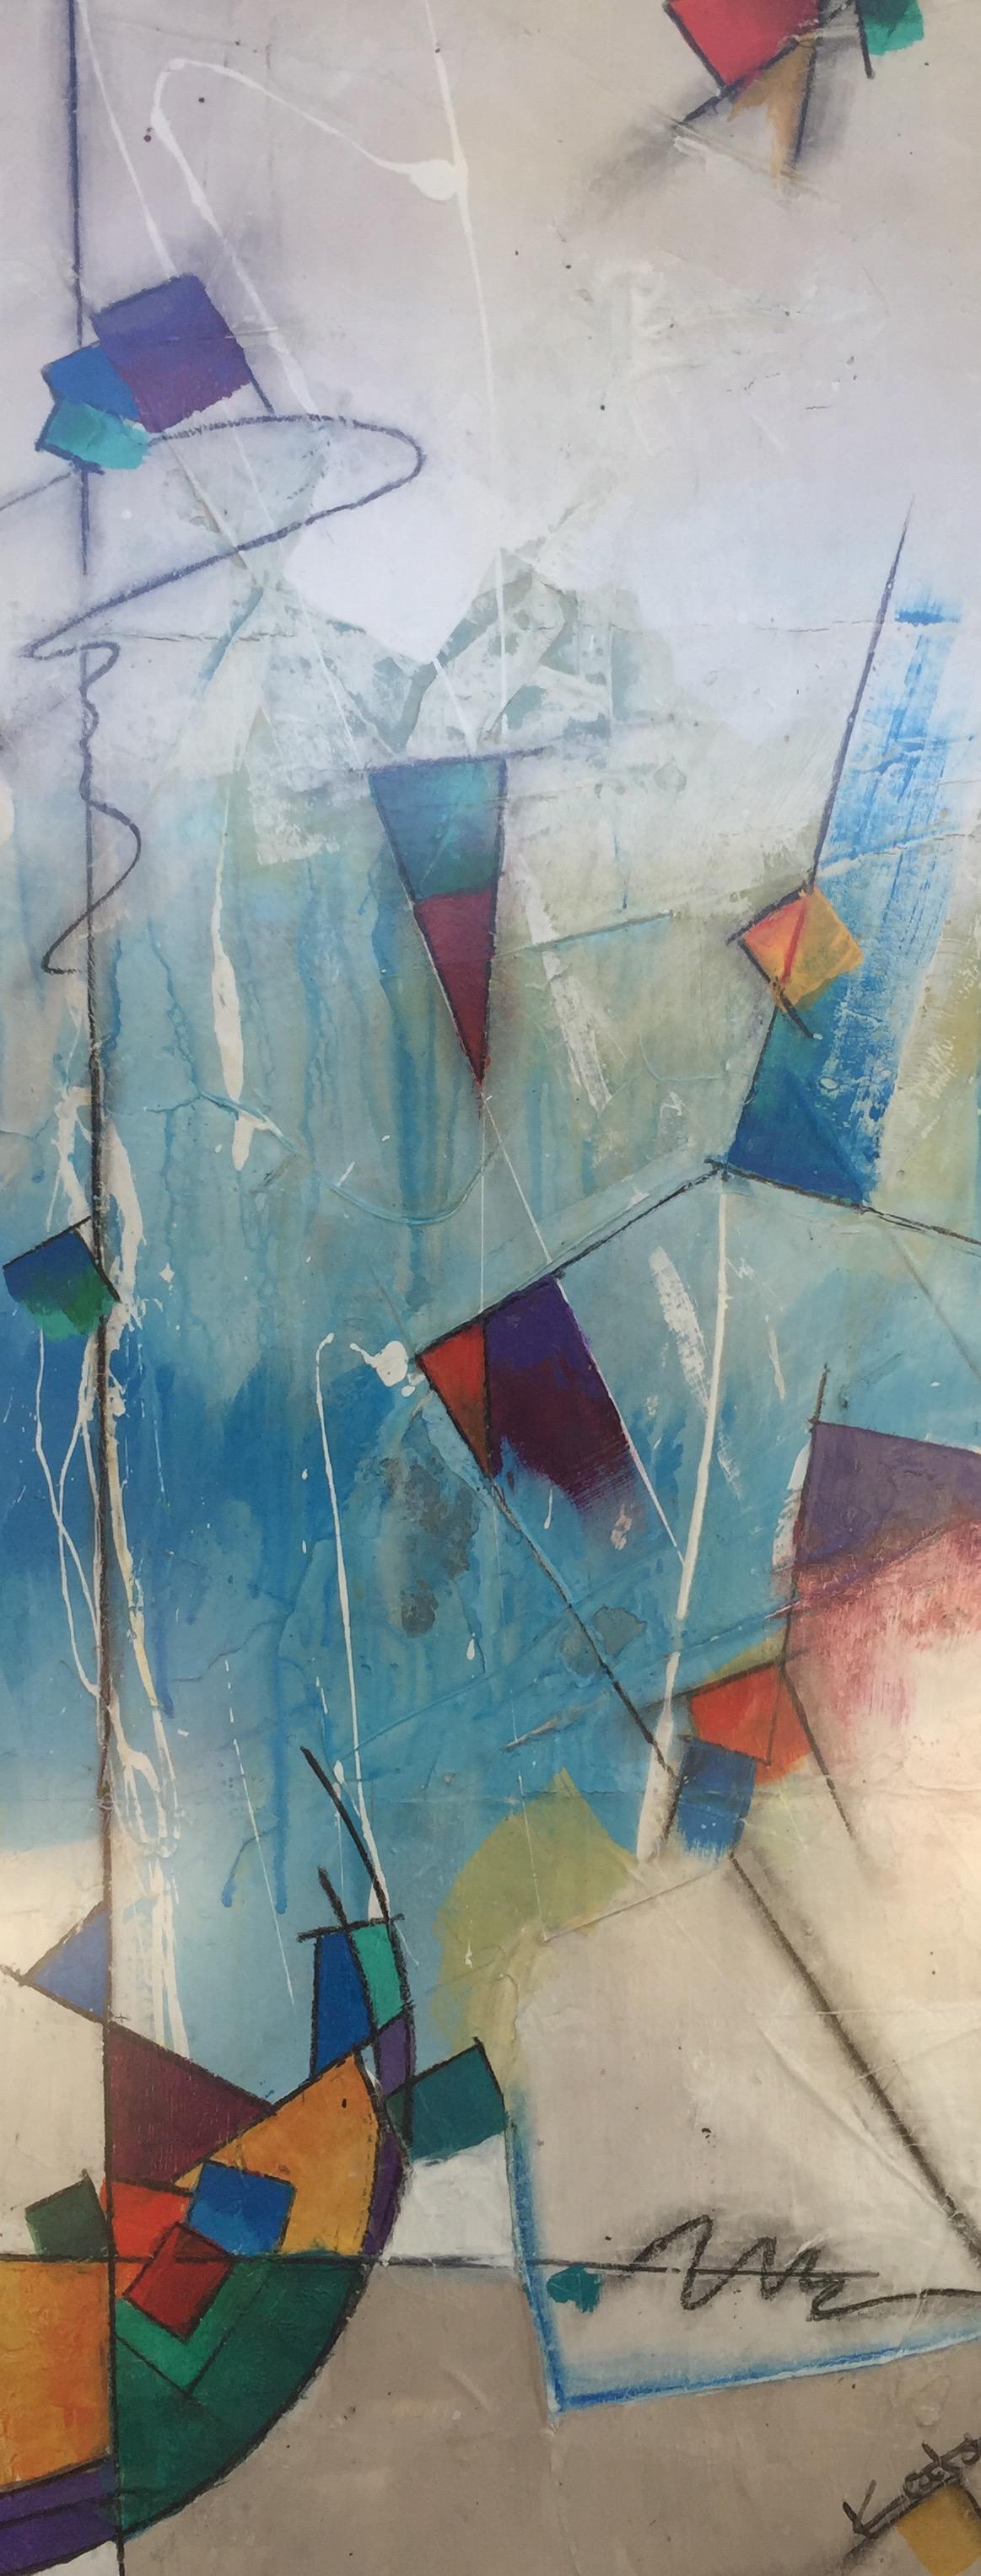 """Fallen Skies"" by David Keator, 13x31in, oil on canvas, $950 | BUY NOW"